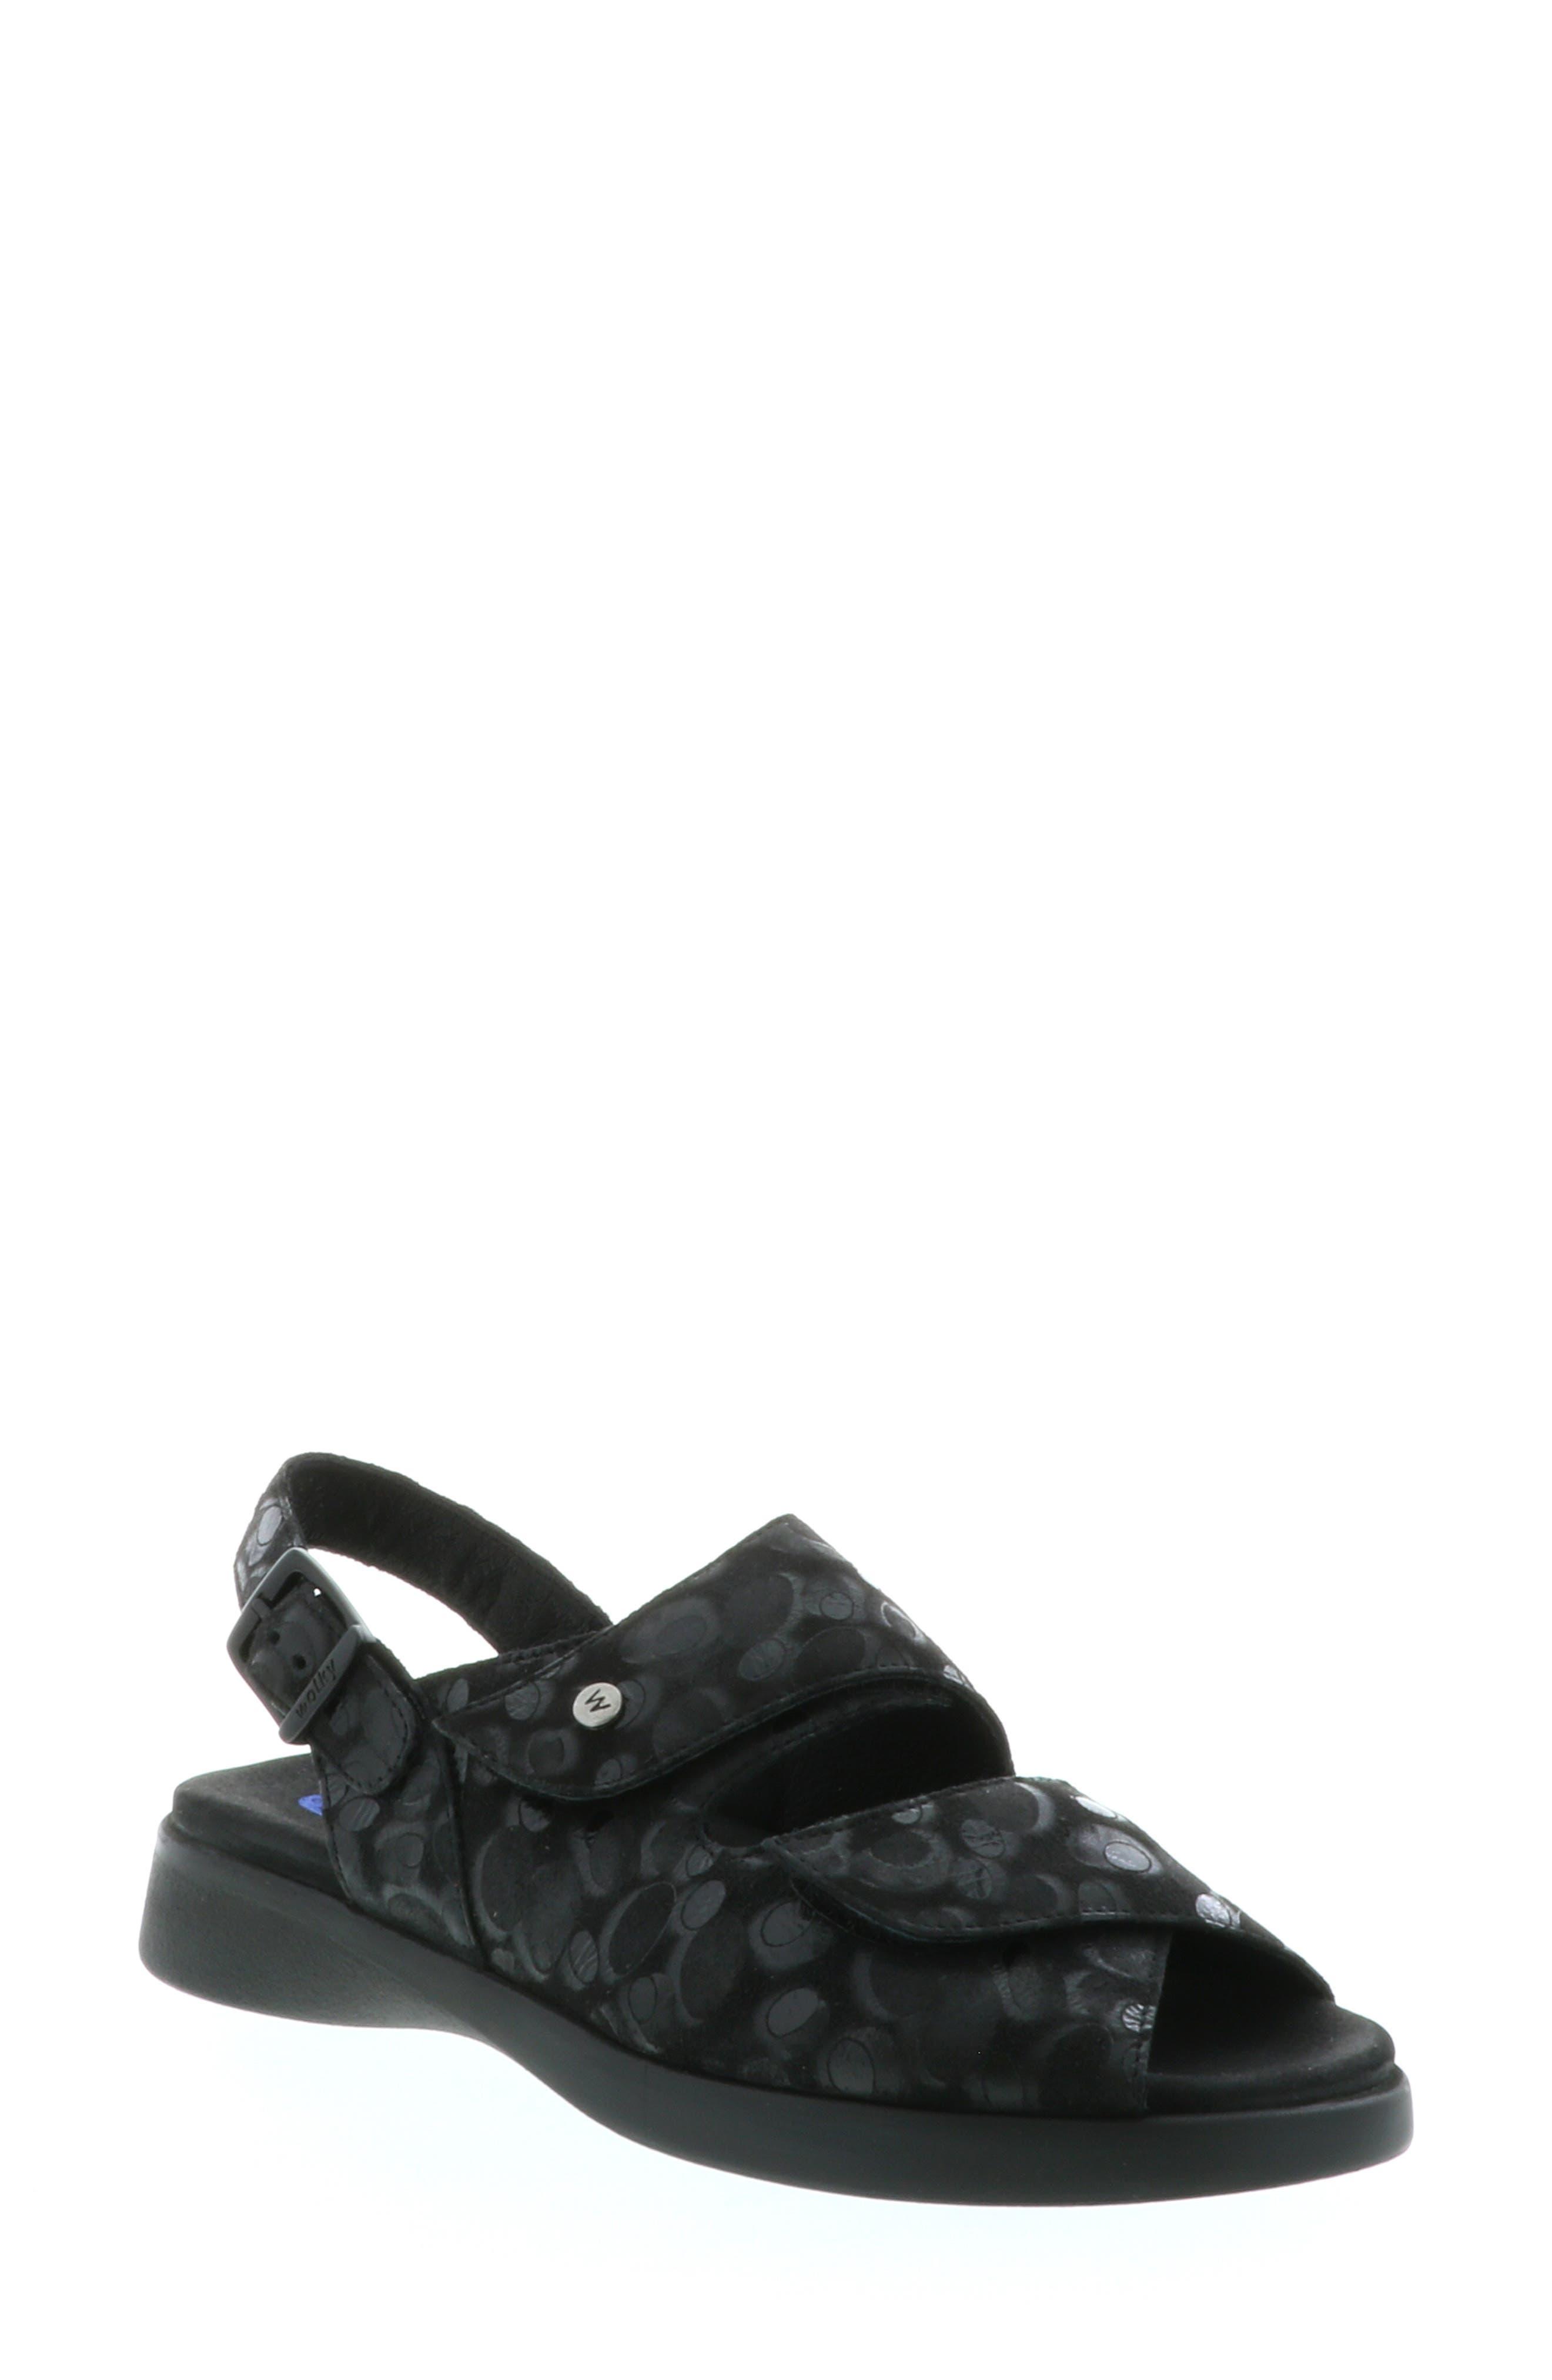 Nimes Sandal,                         Main,                         color, BLACK